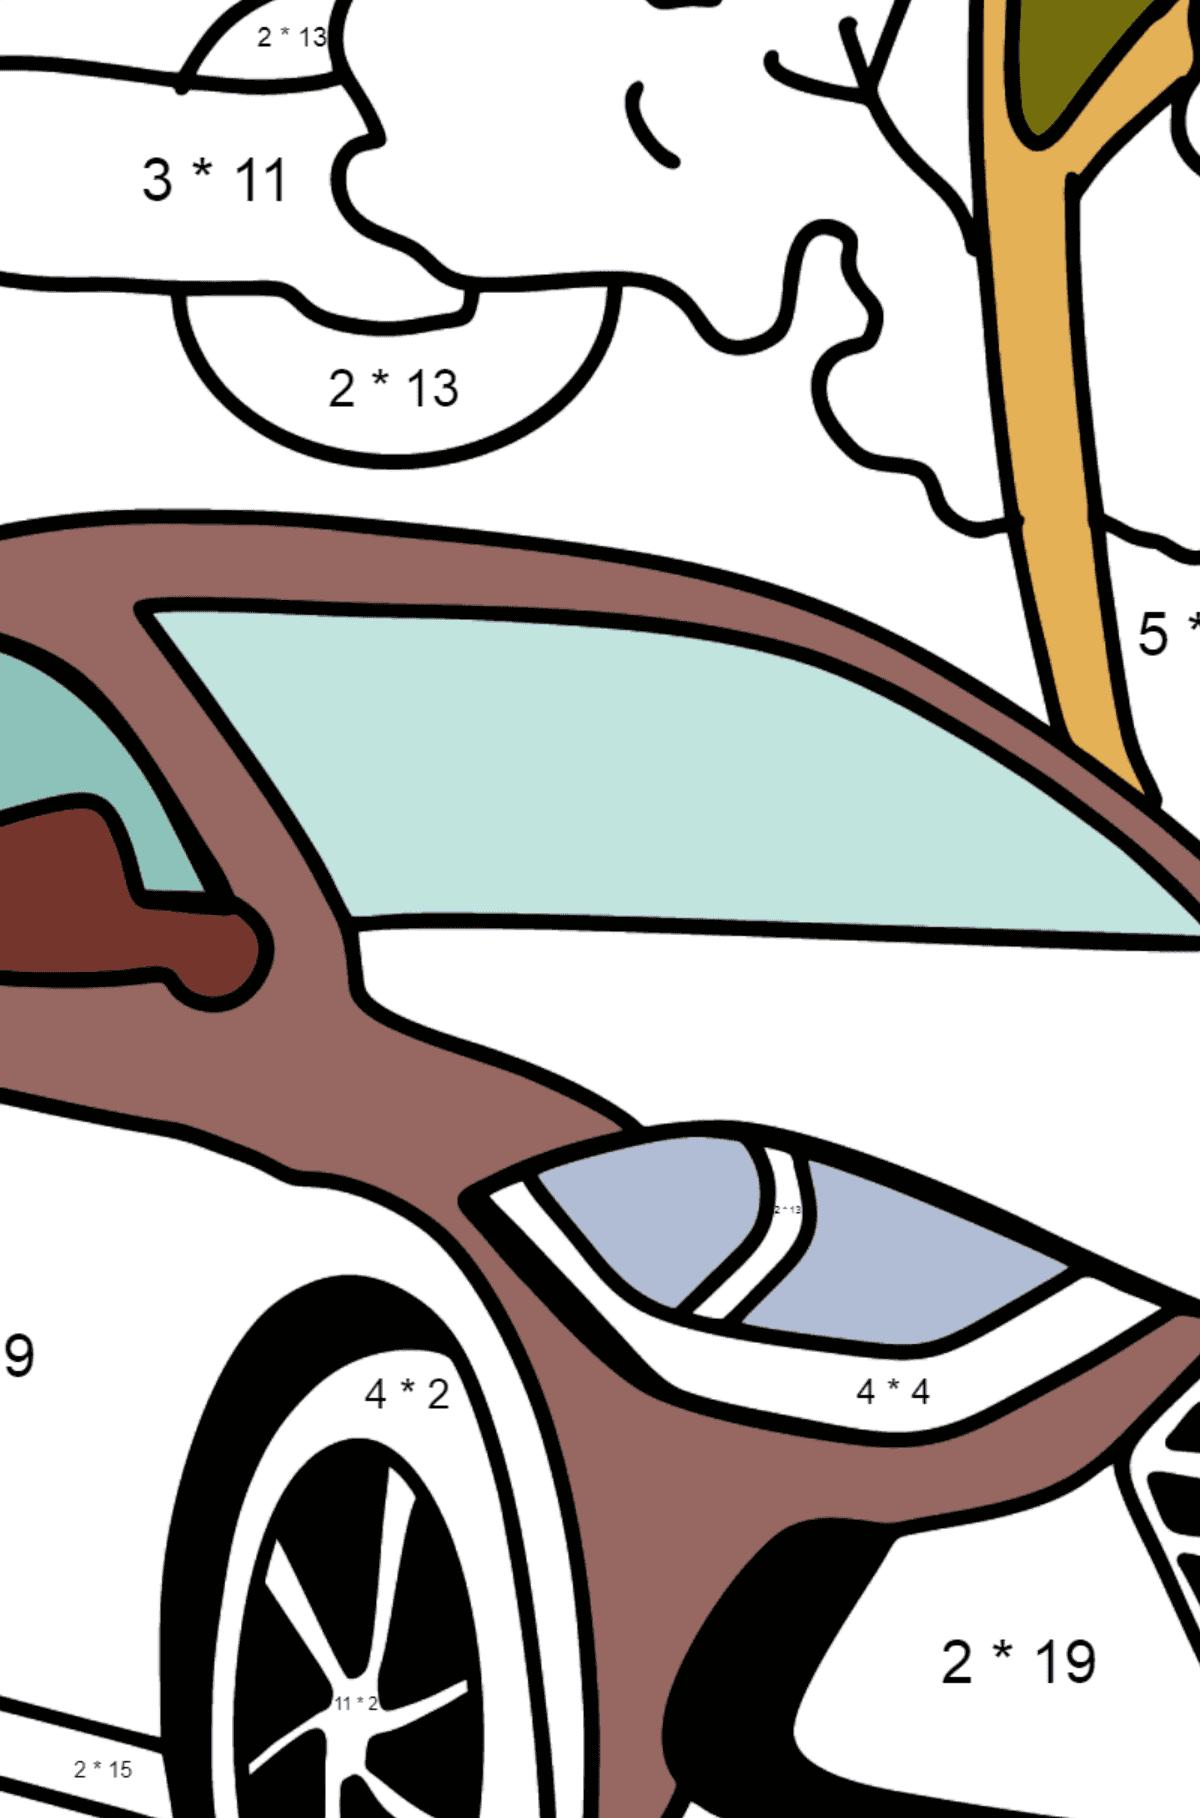 Hyundai car coloring page - Math Coloring - Multiplication for Kids